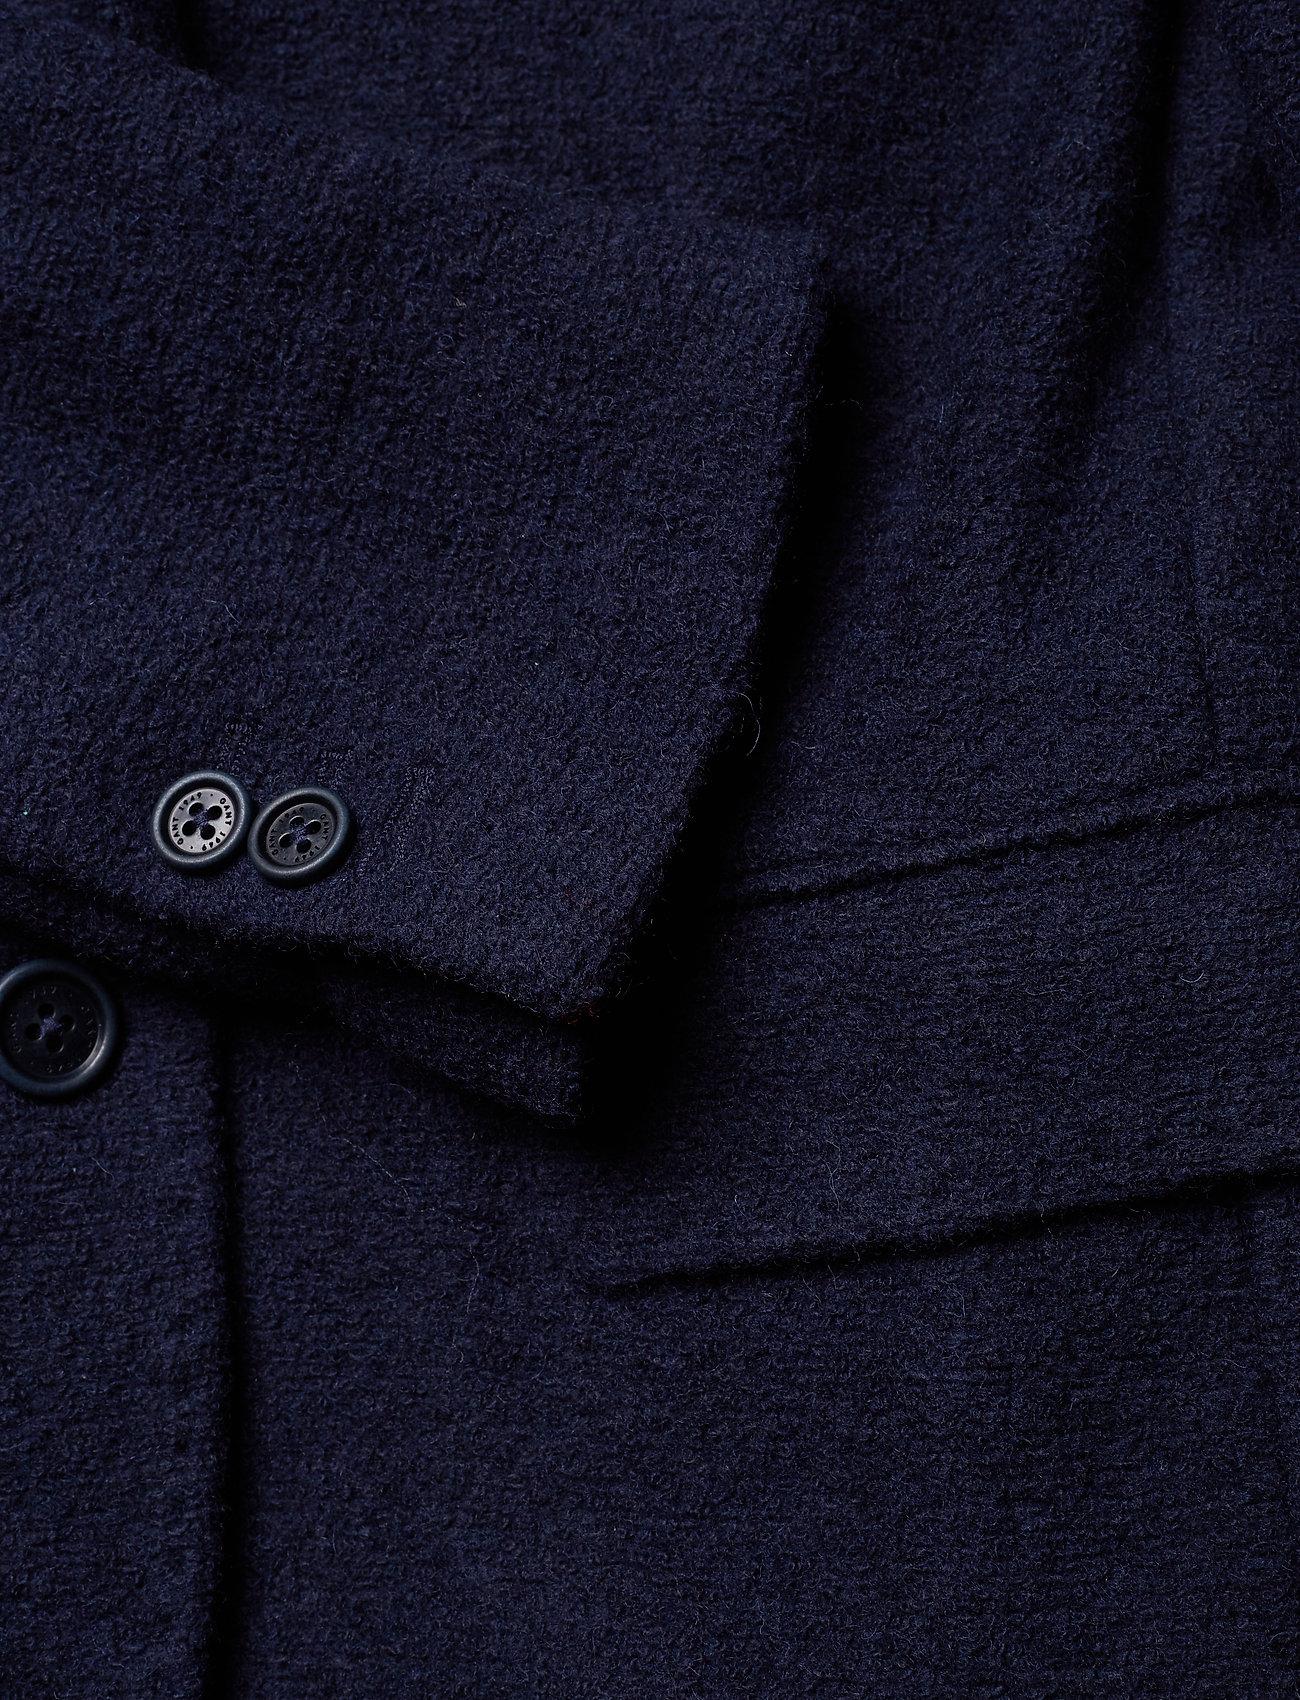 G2Boiled BlazermarineGant G2Boiled Wool G2Boiled BlazermarineGant Wool BlazermarineGant Wool eWD2bIHY9E